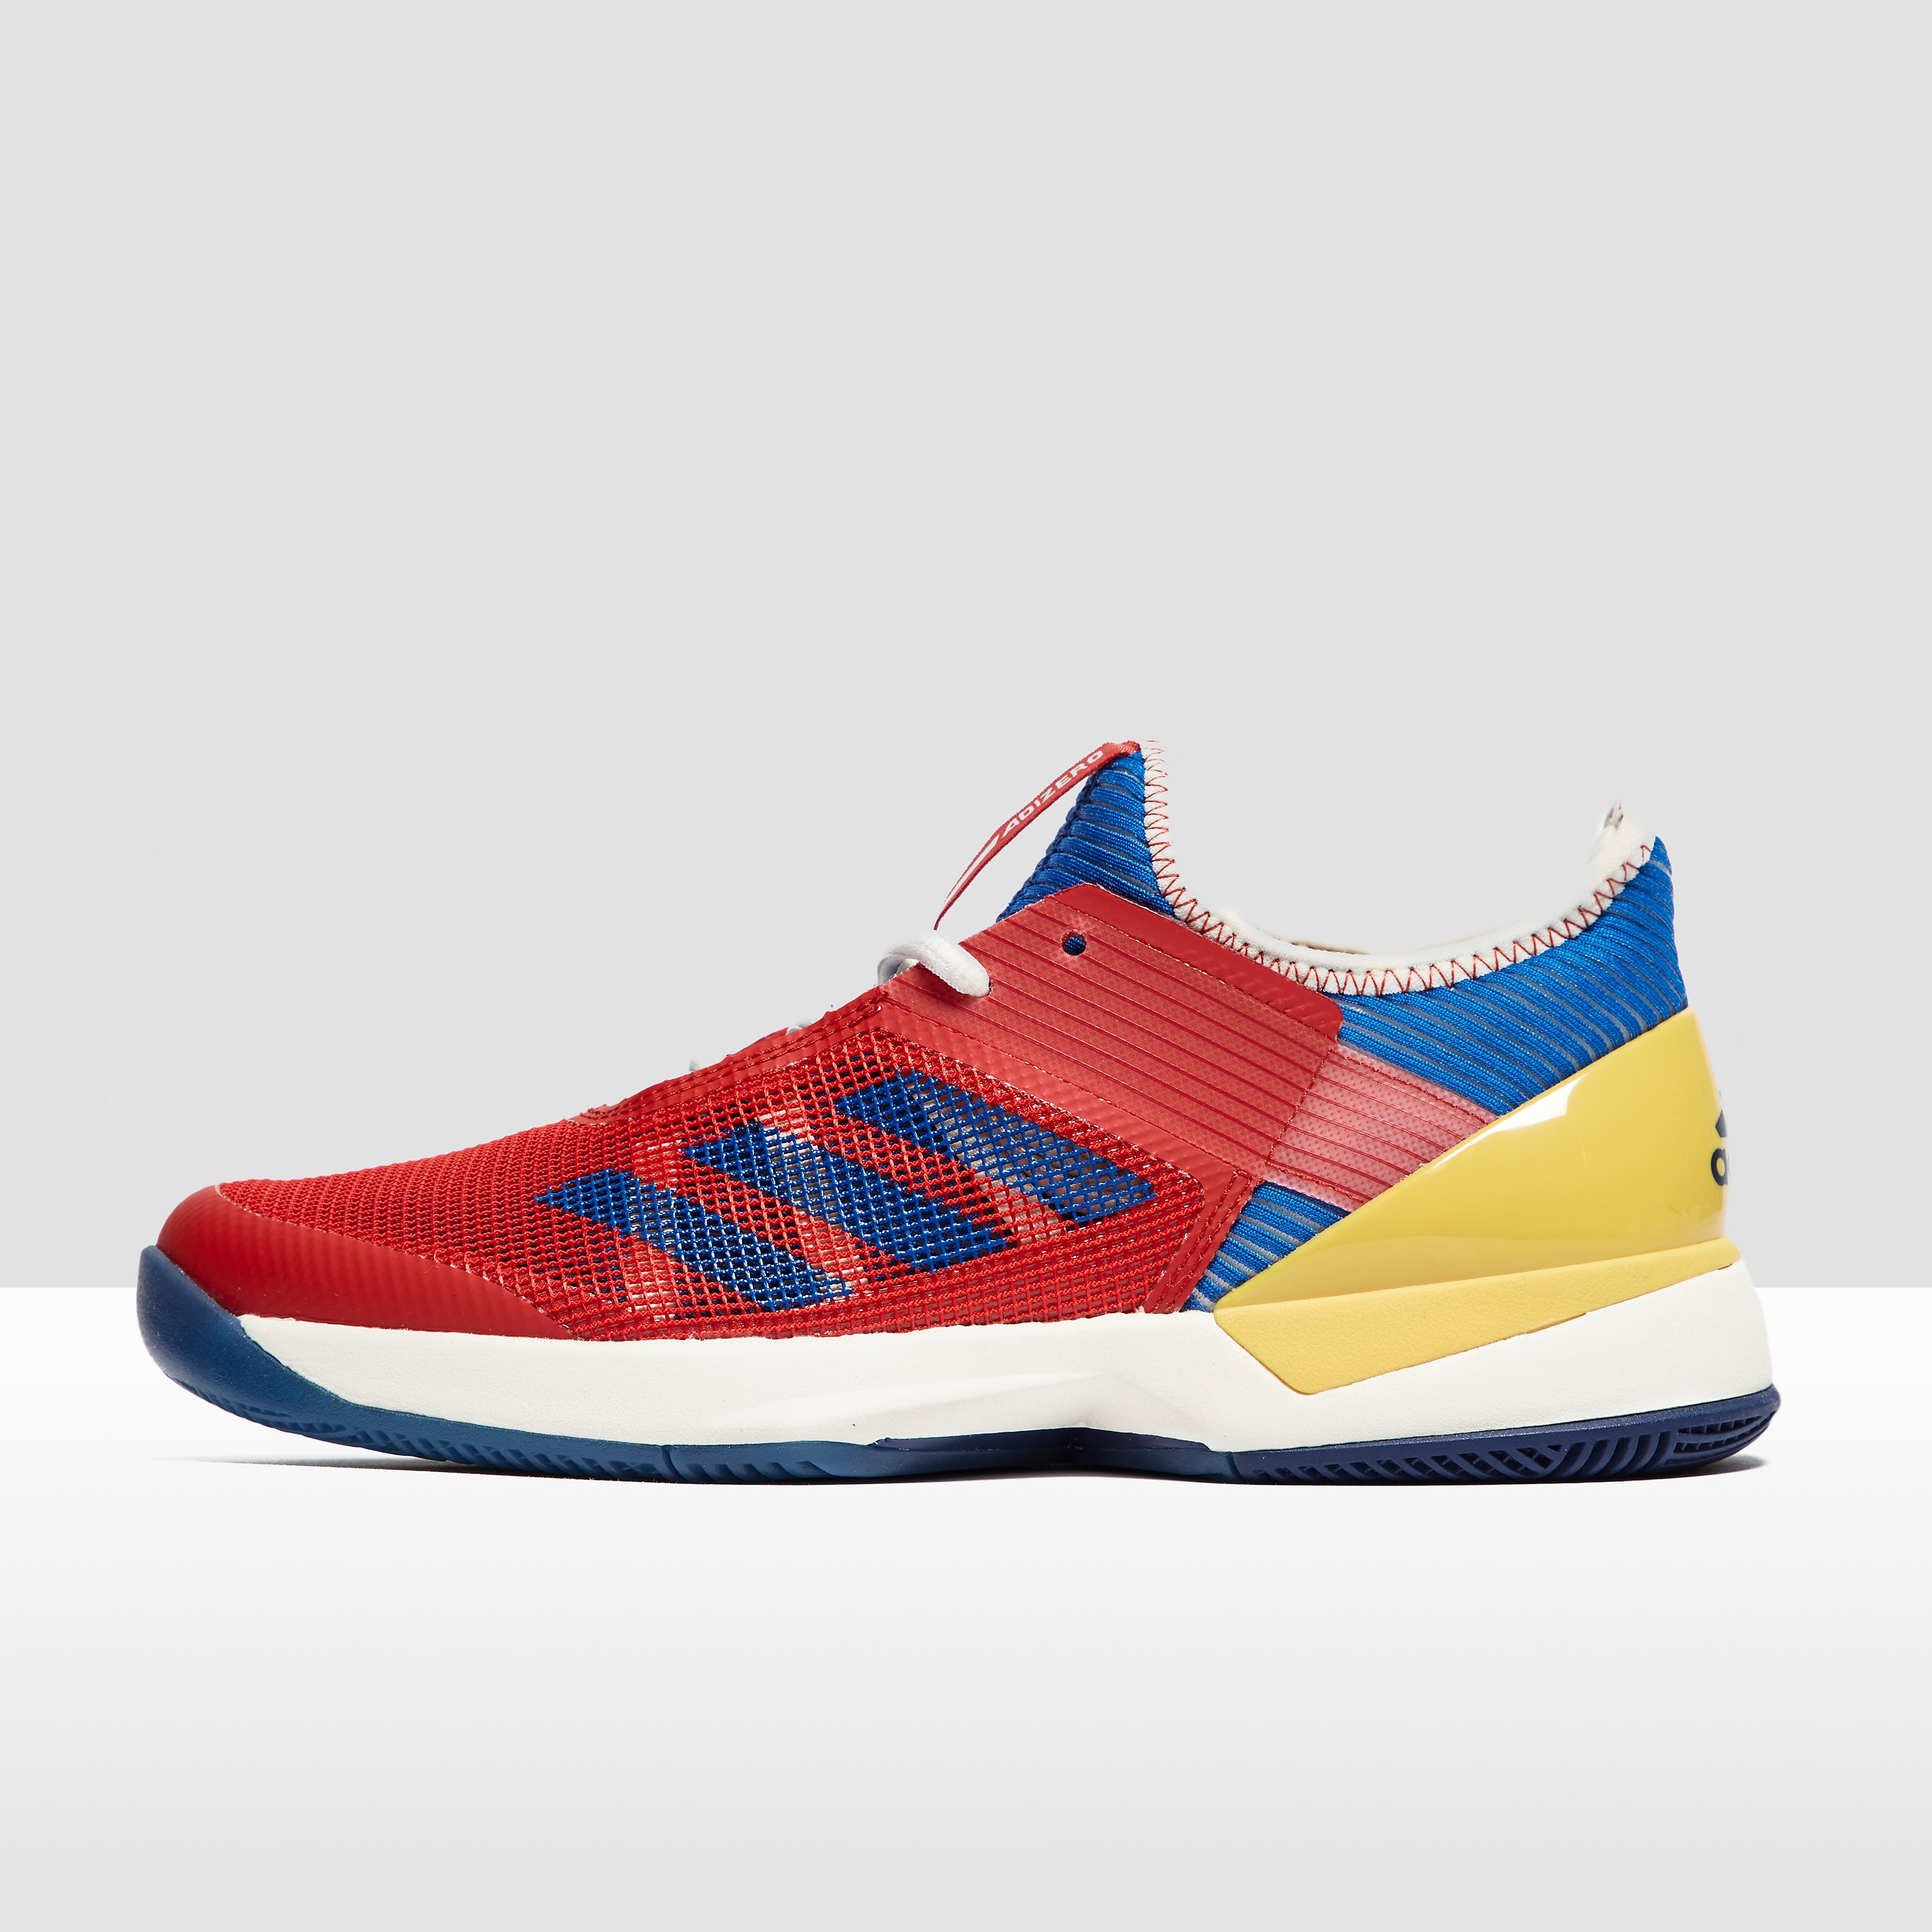 adidas Adizero Ubersonic 3.0 Pharrell Williams Women's Tennis Shoes